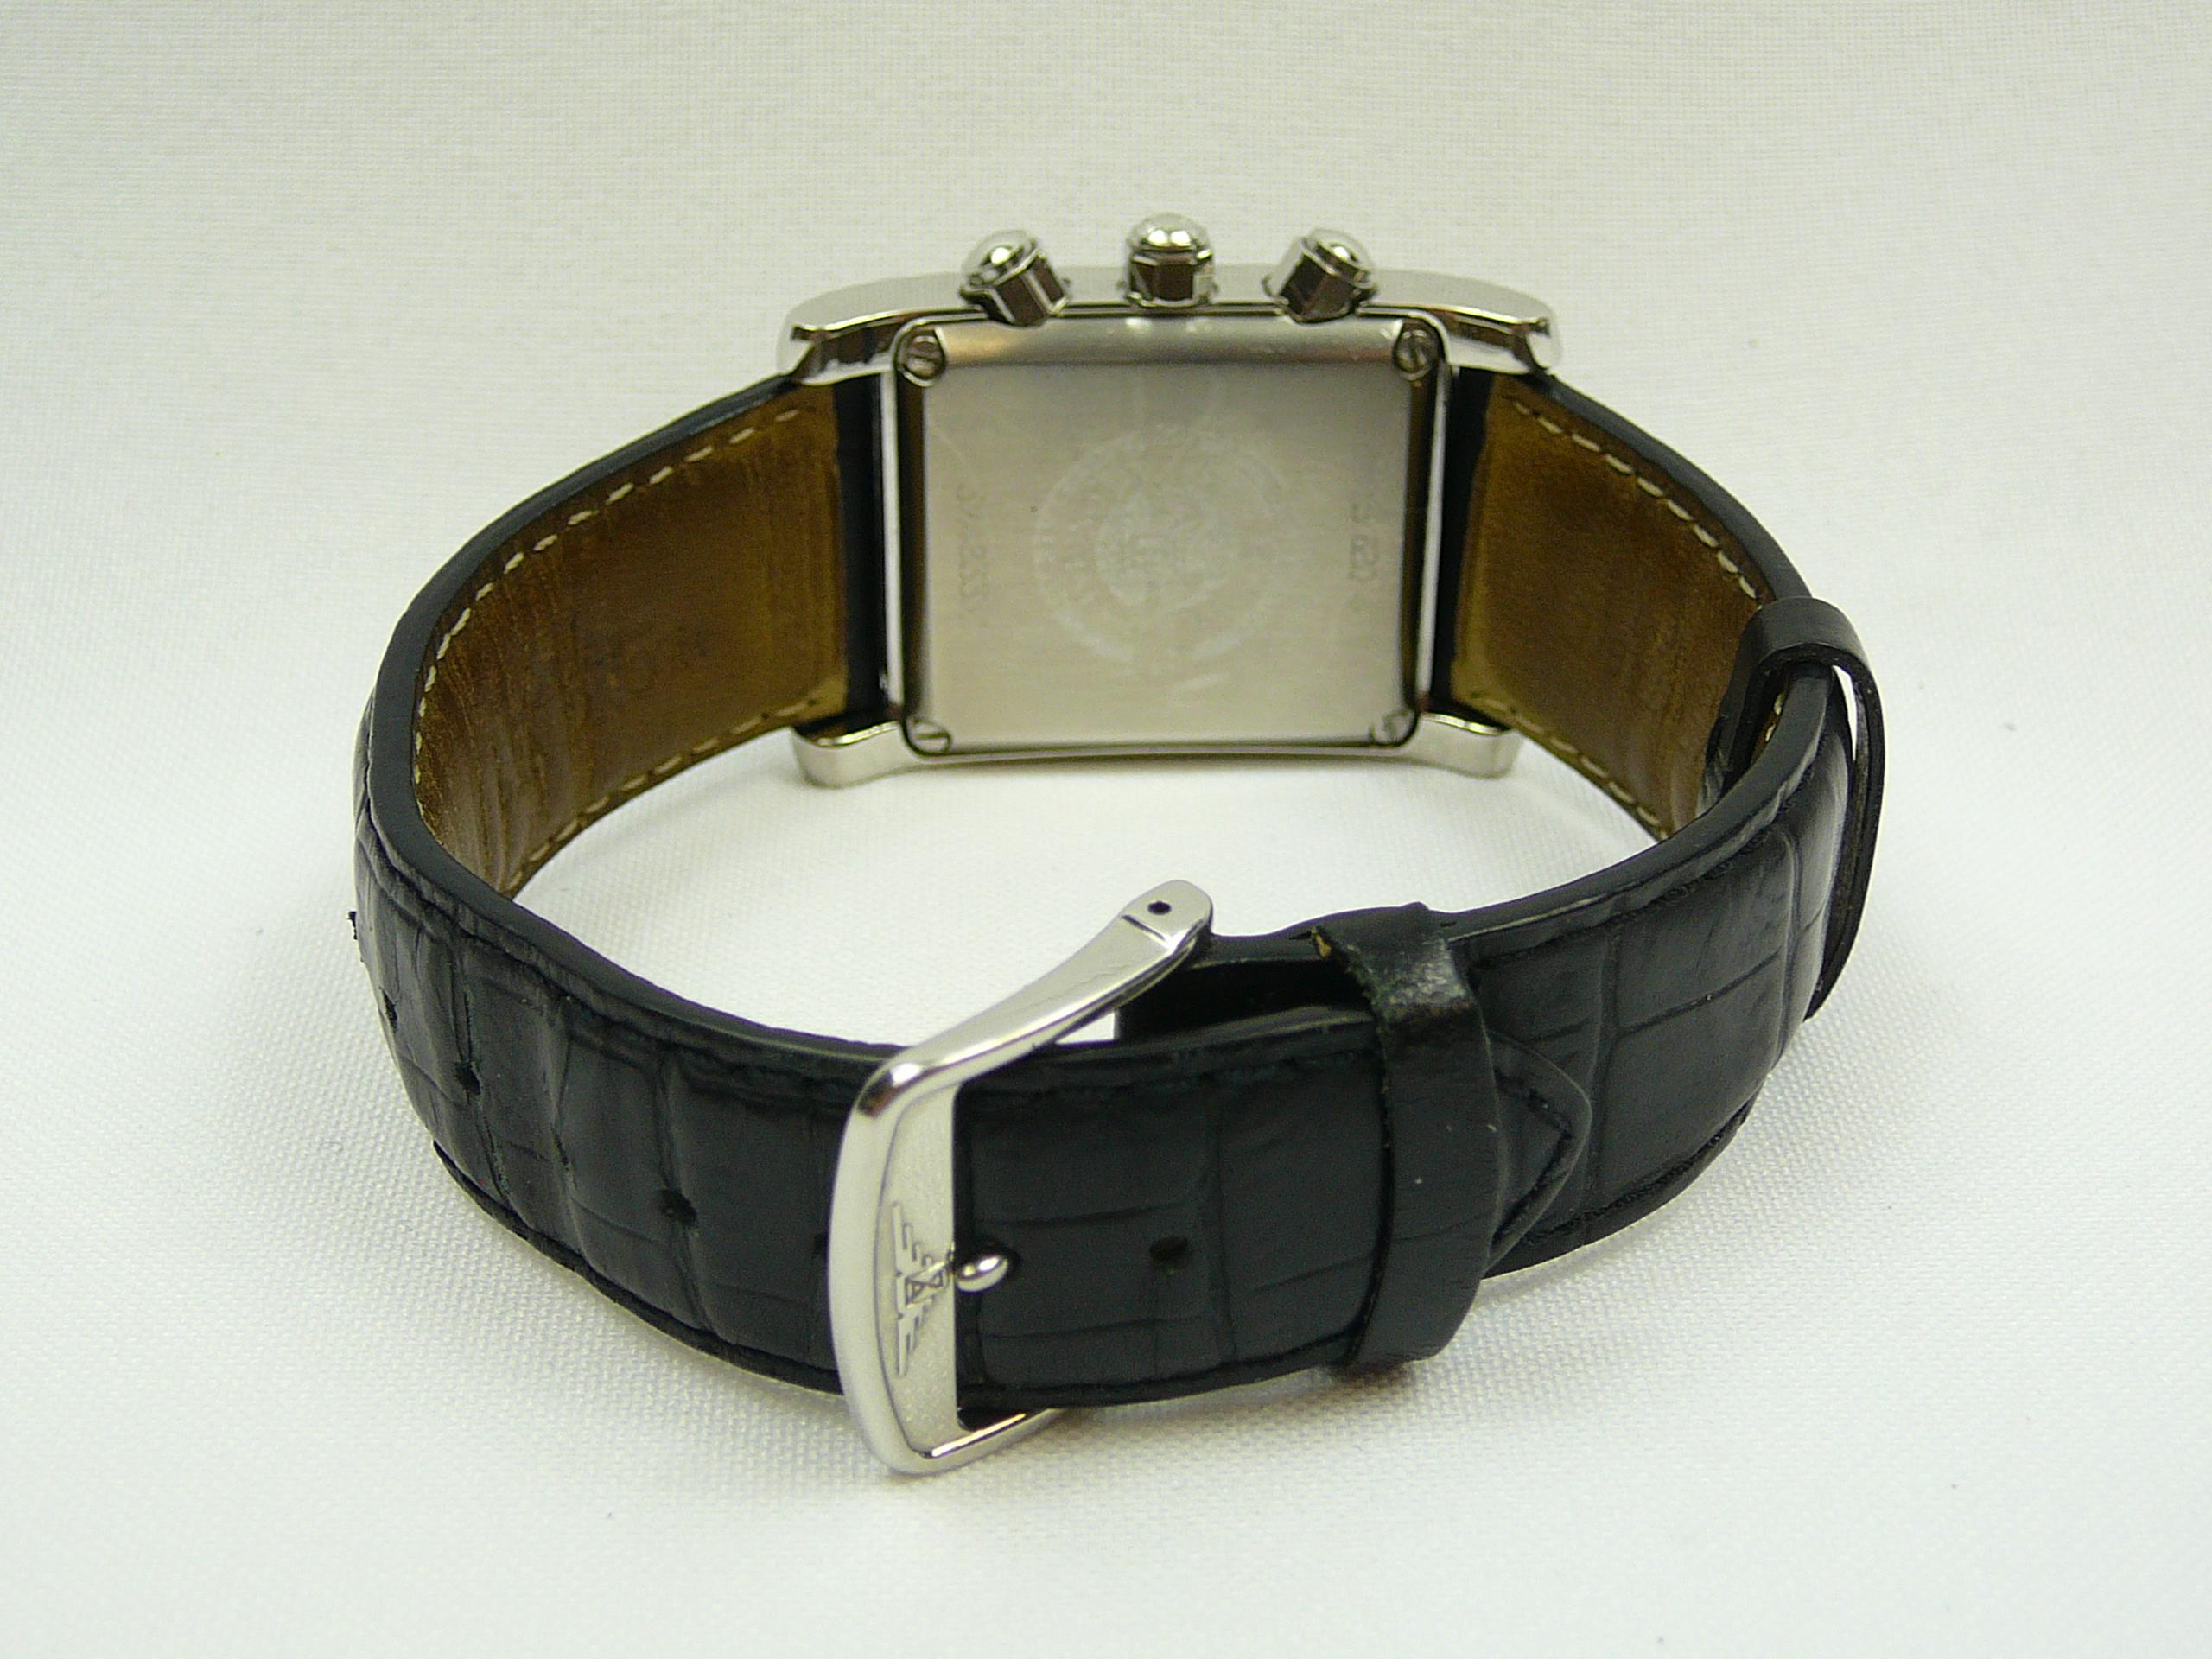 Gents Longines Wrist Watch - Image 3 of 4